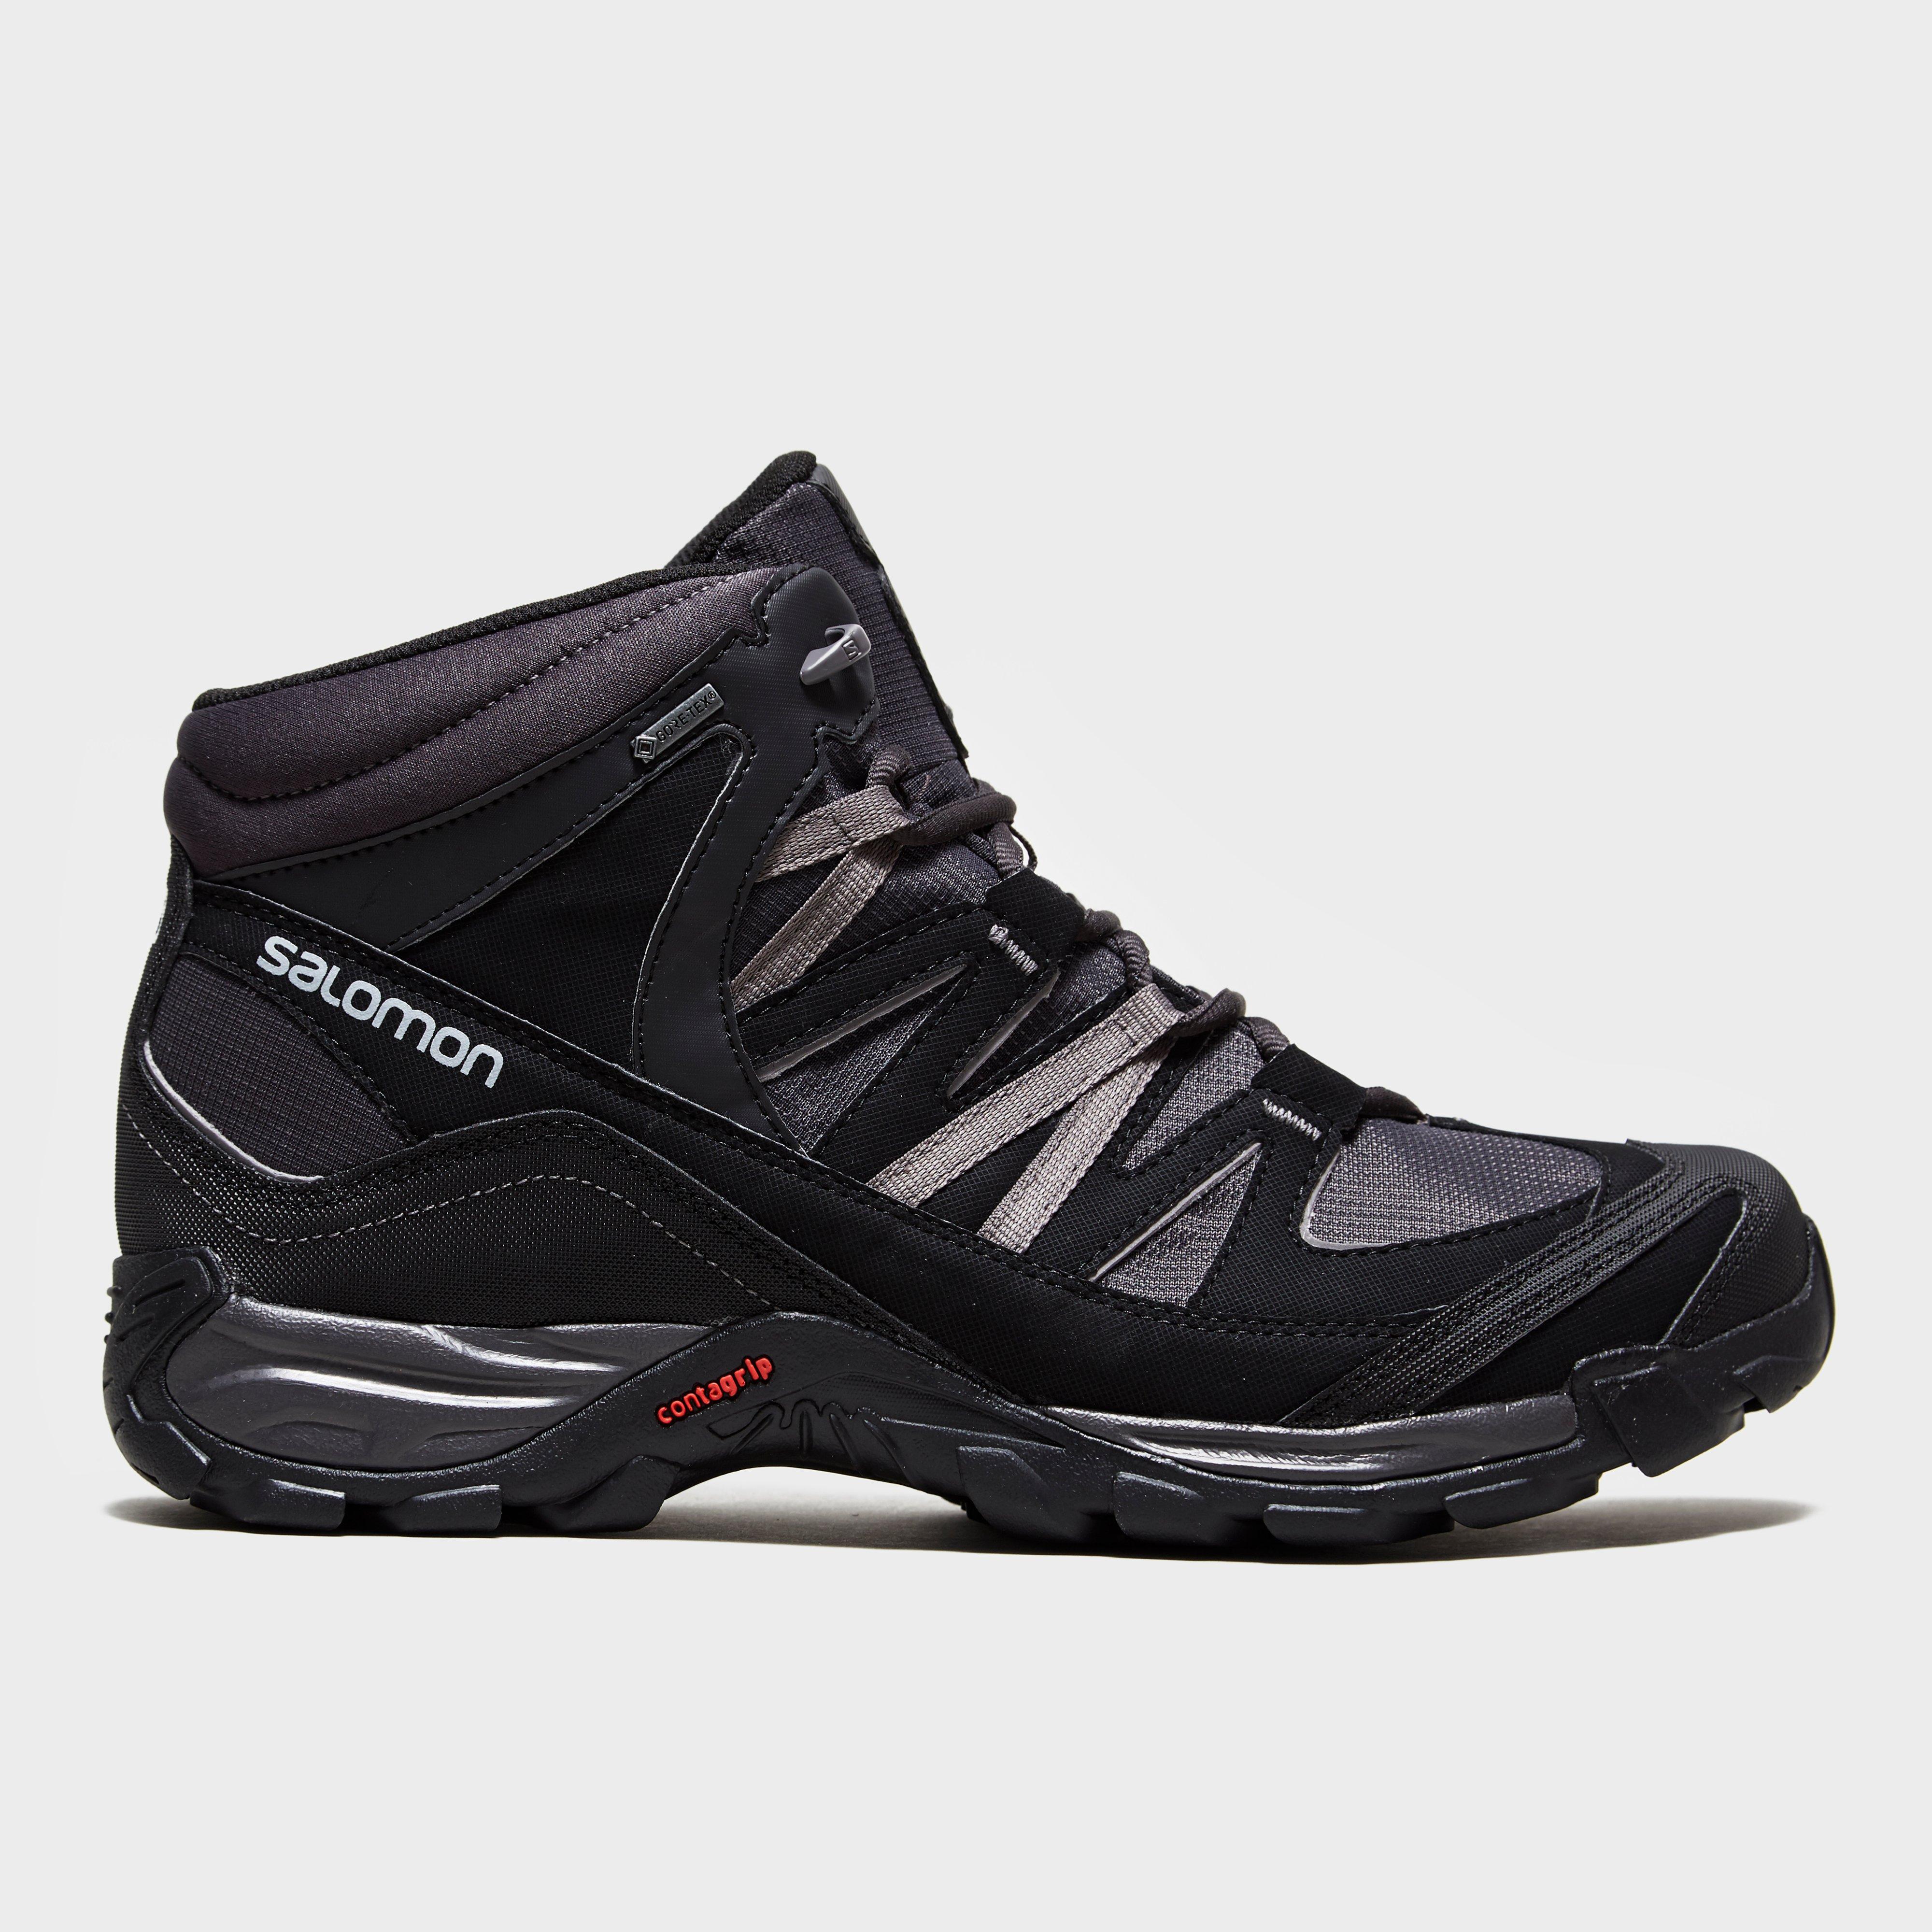 Salomon Men's Mudstone GORE-TEX Walking Boot - Grey, Grey Review thumbnail